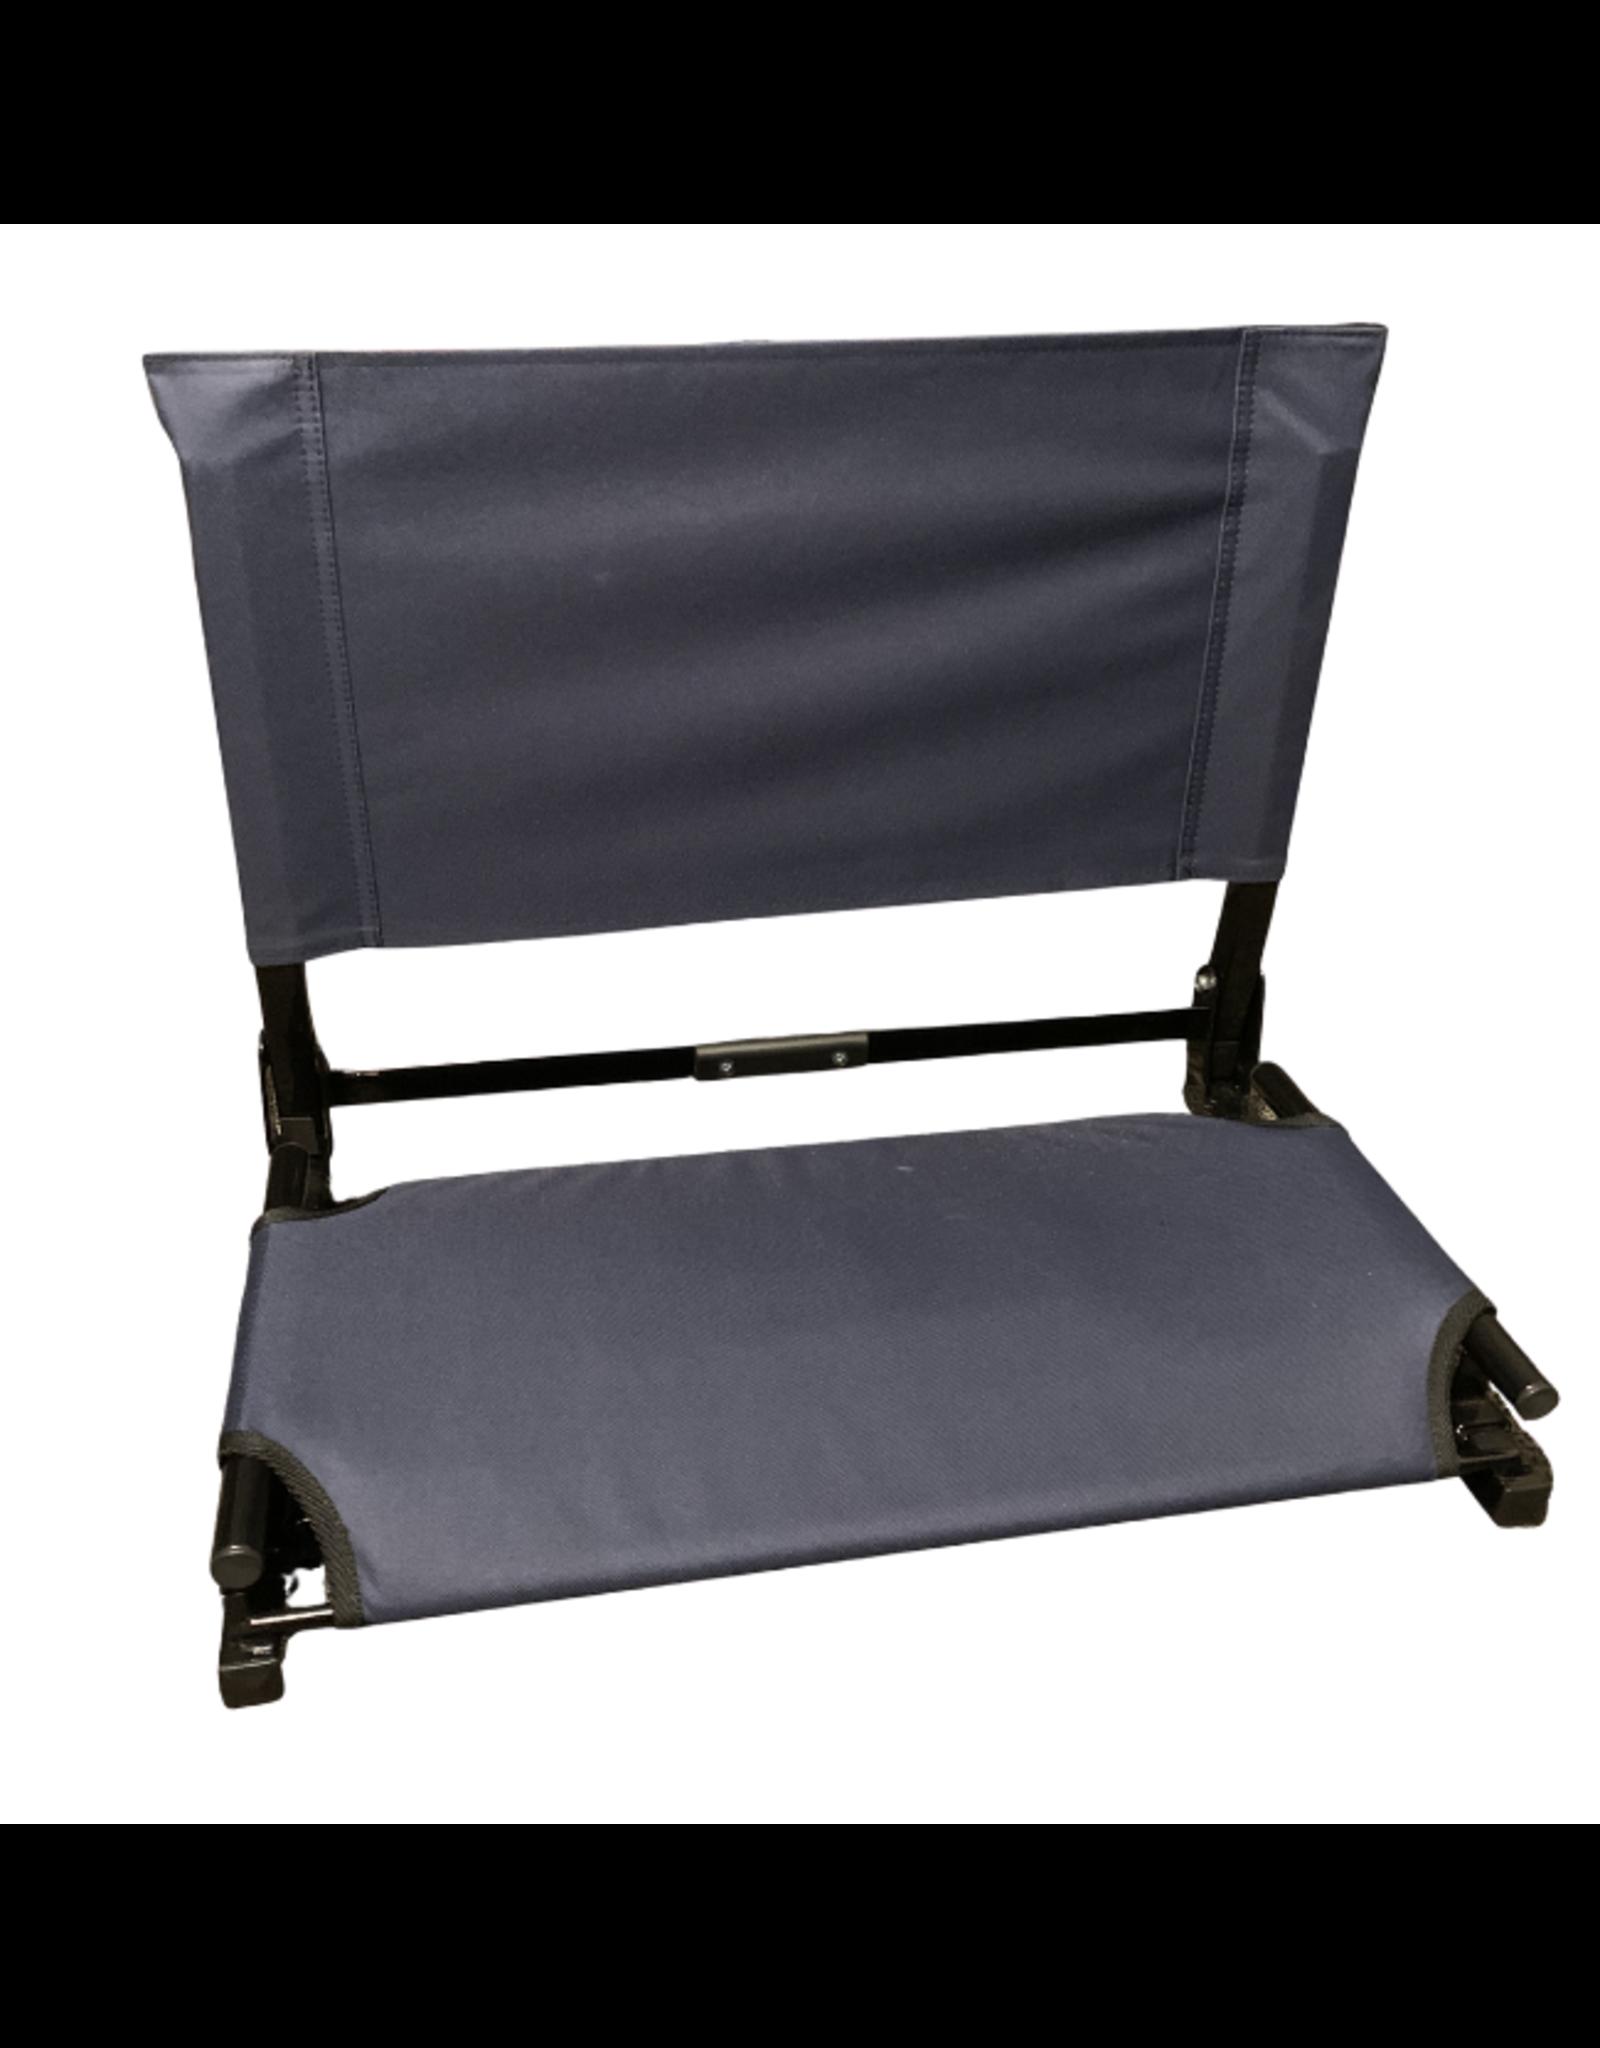 The Stadium Chair Company Stadium Chairs (Large Navy)